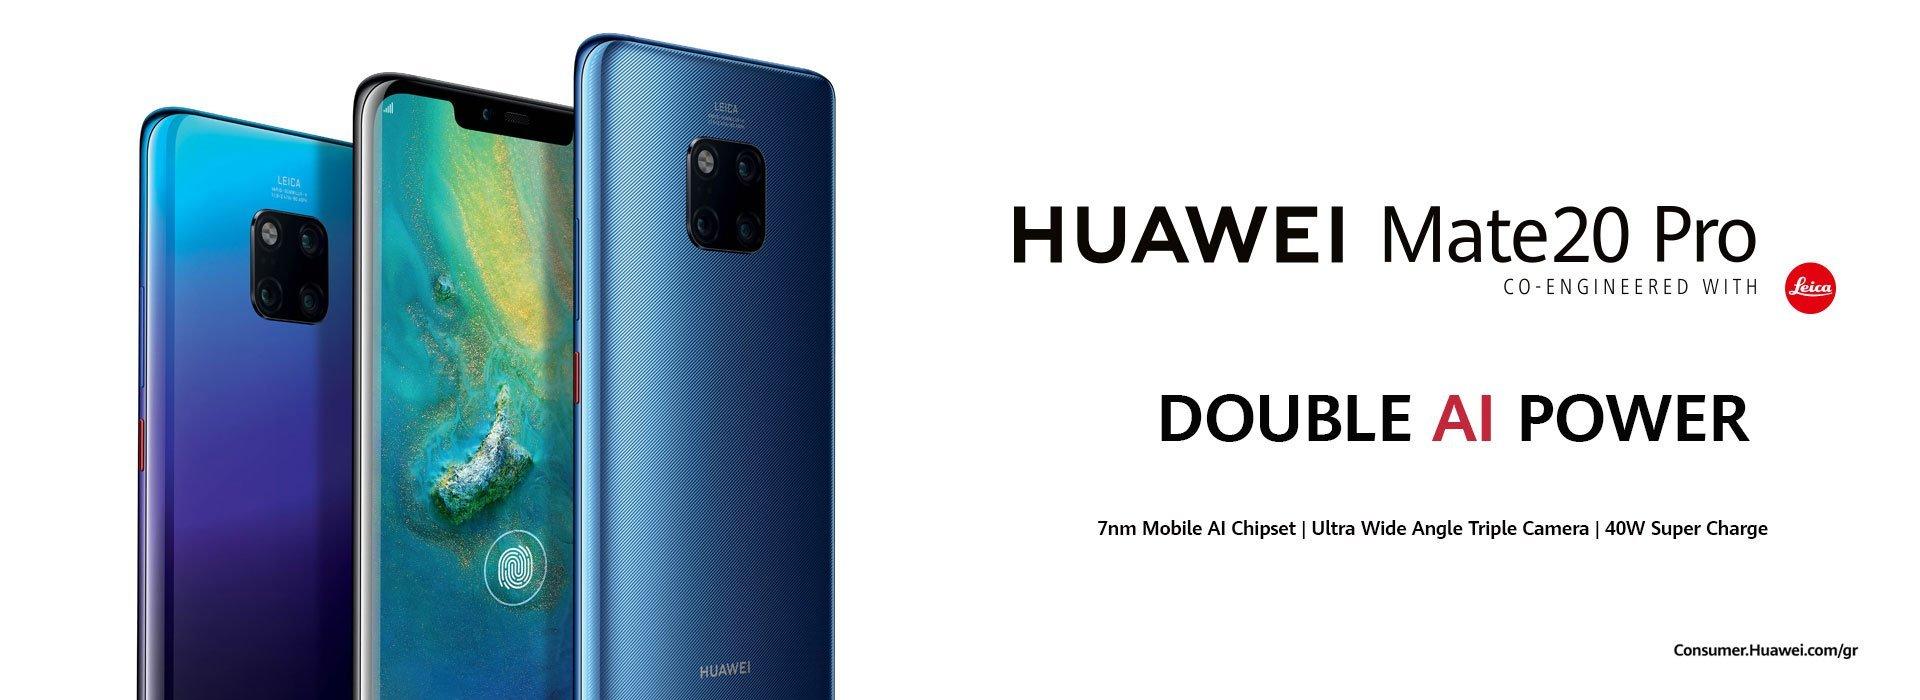 Huawei Mate 20 Pro EN